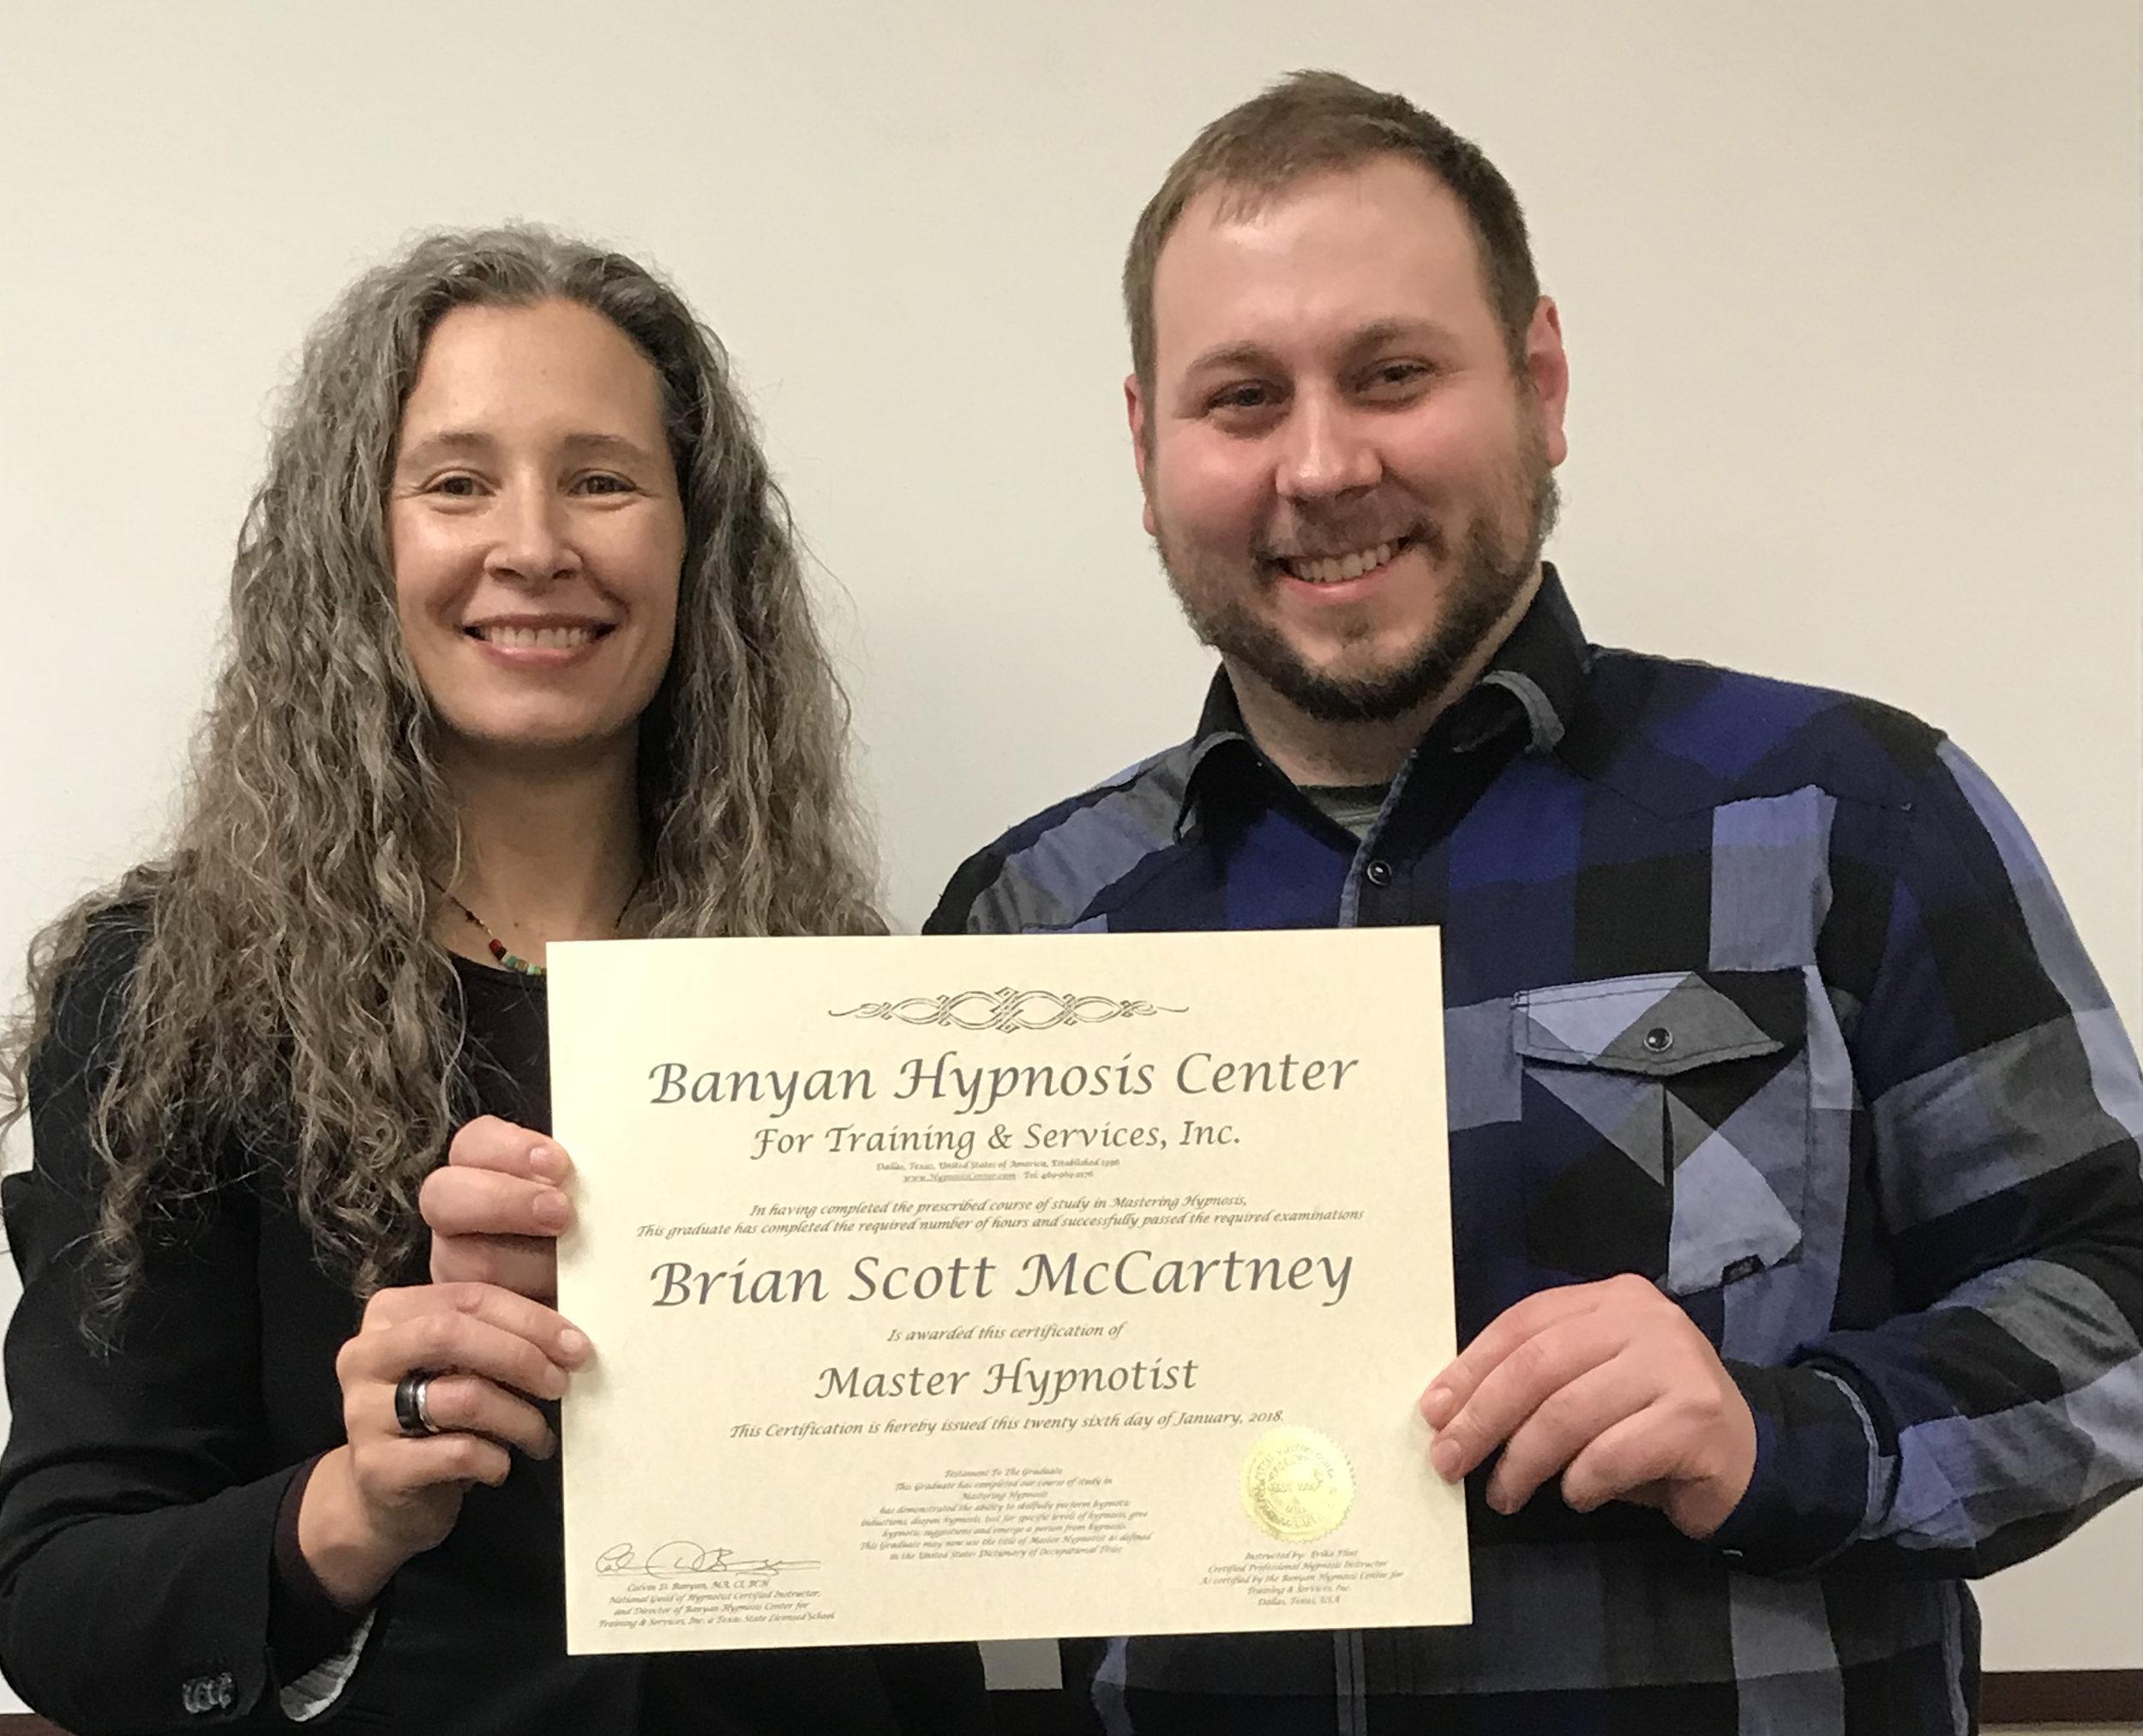 Brian-Mcartney-Erika-Flint-Hypnosis-Certification-Training.jpg